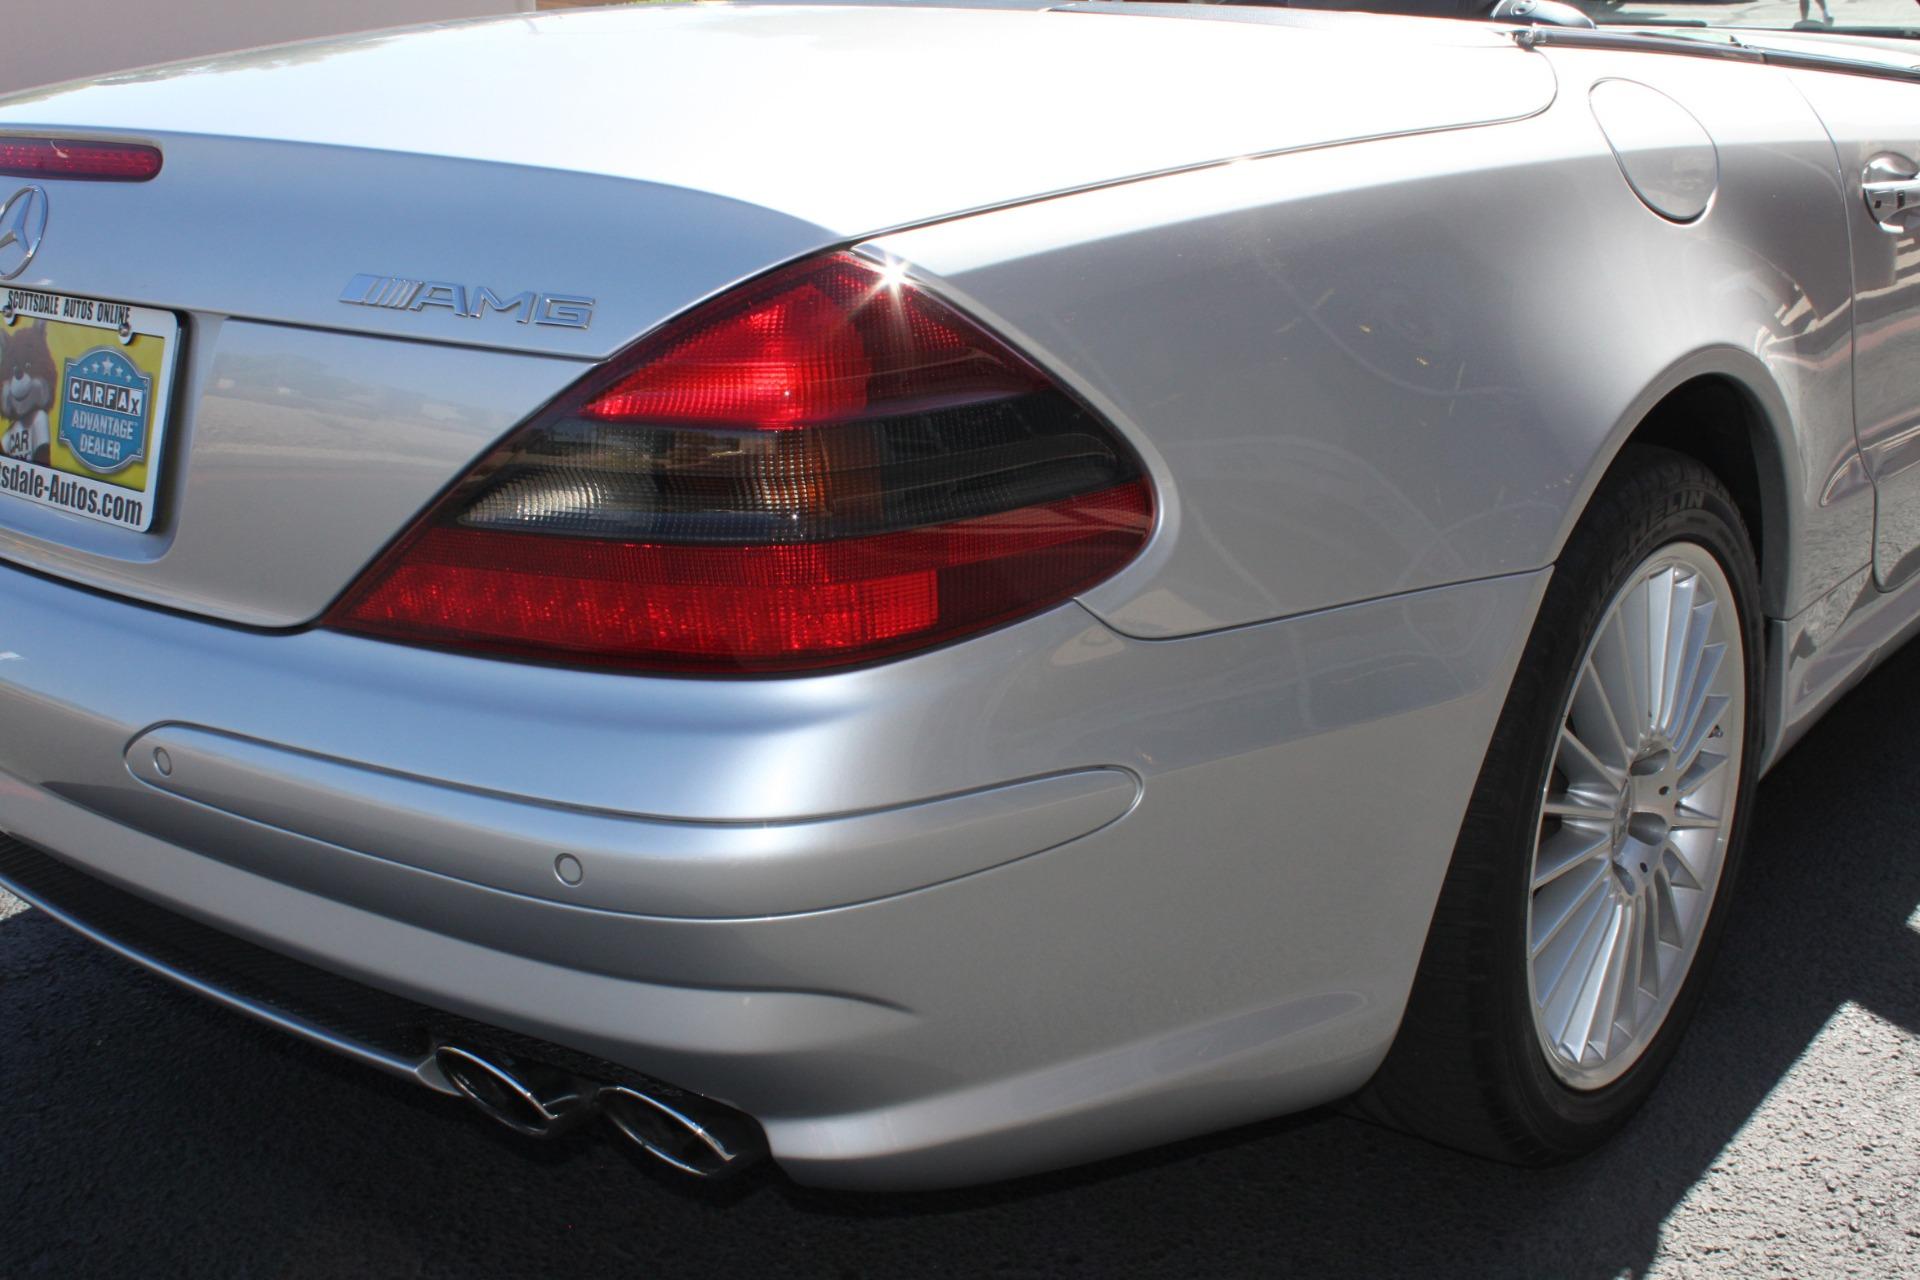 Used-2003-Mercedes-Benz-SL-Class-AMG-LS400